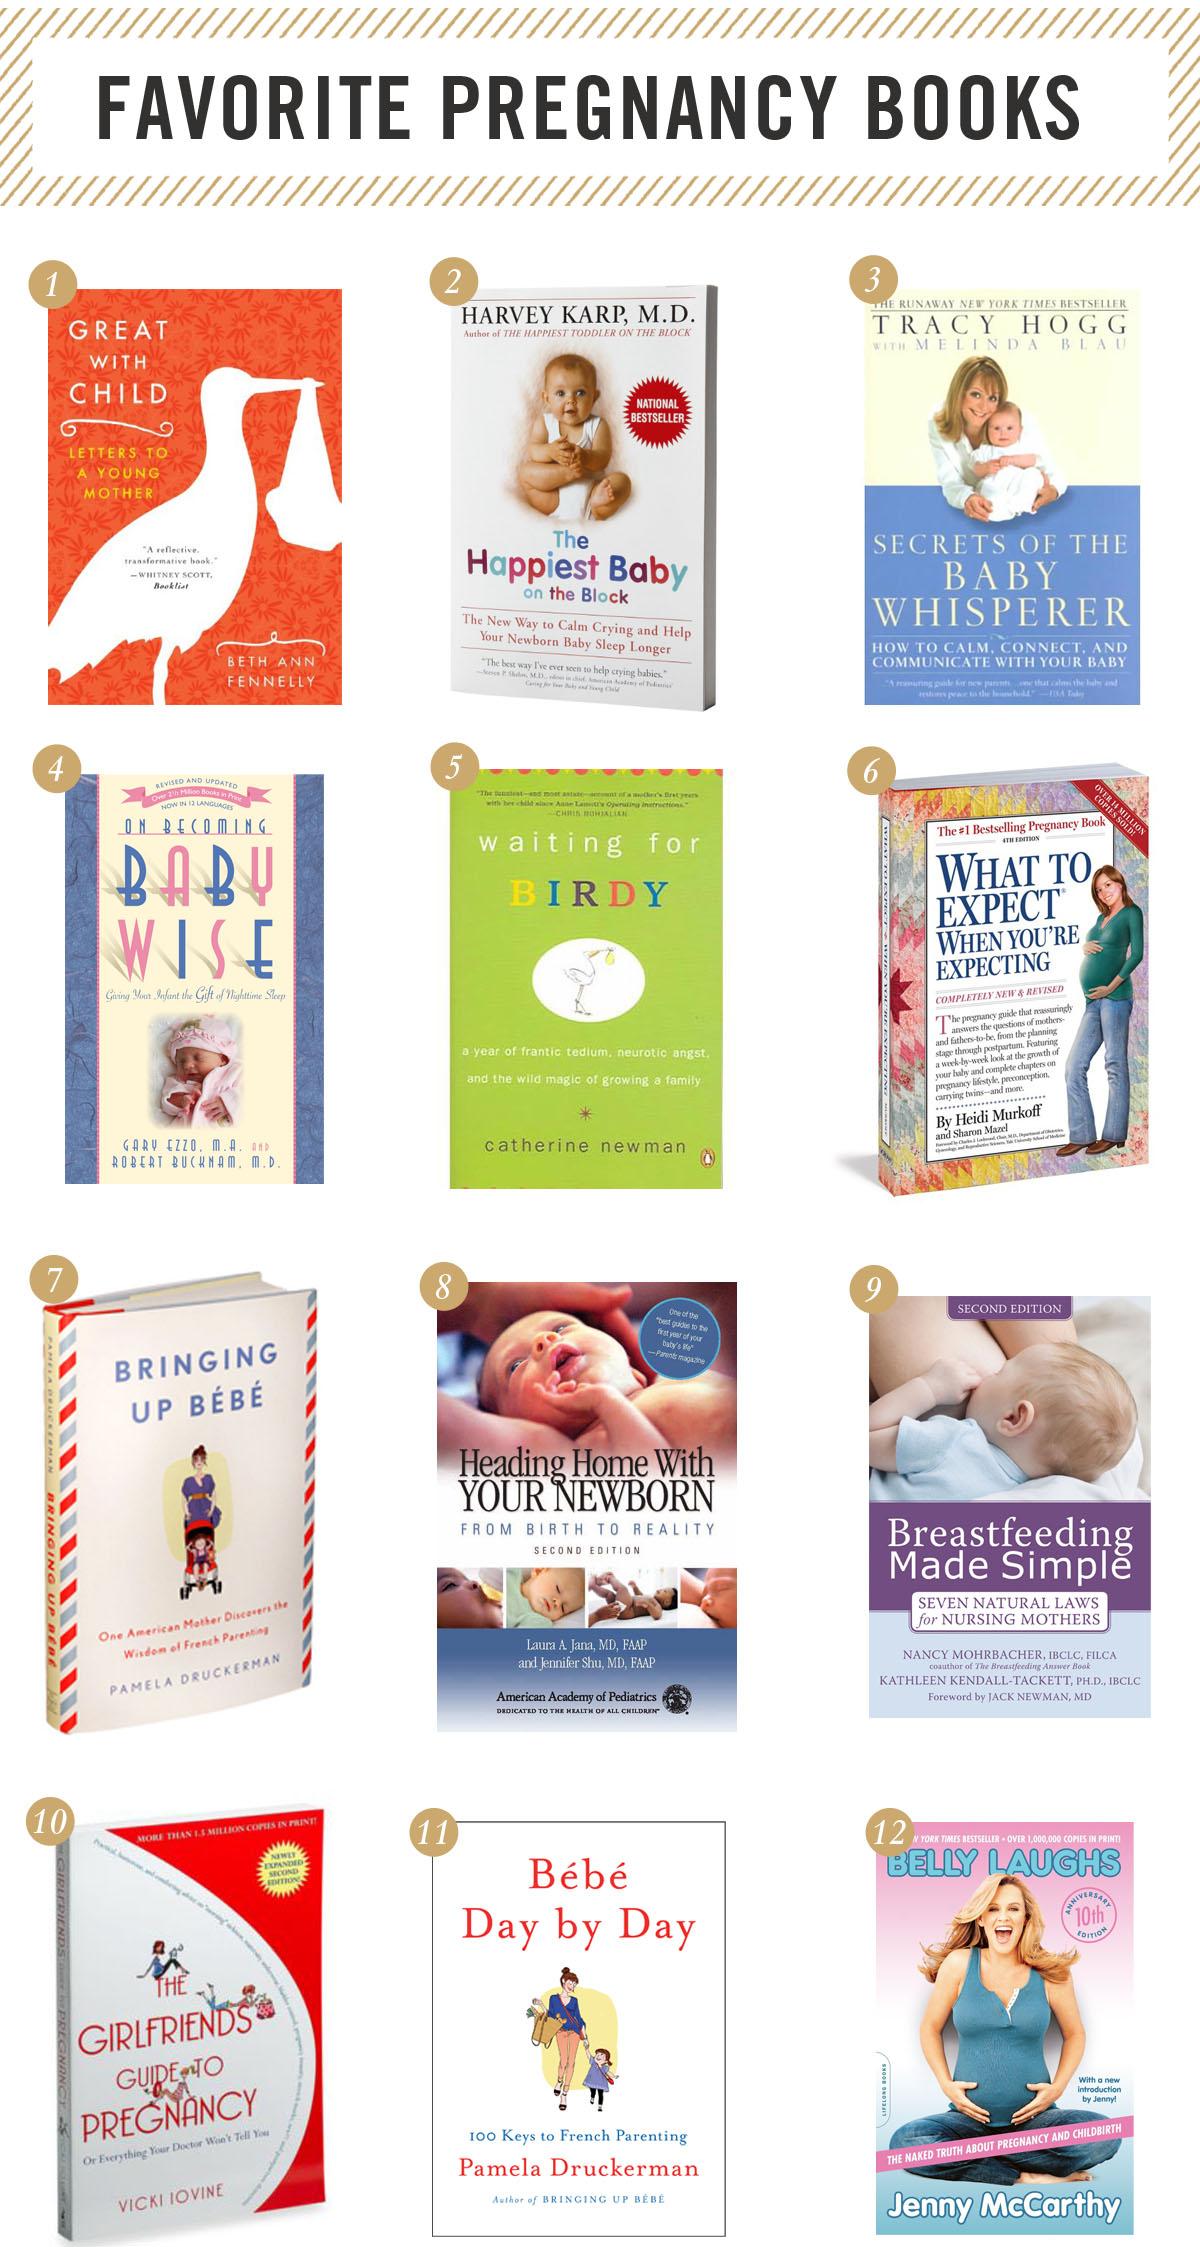 bestpregnancybooks.jpg